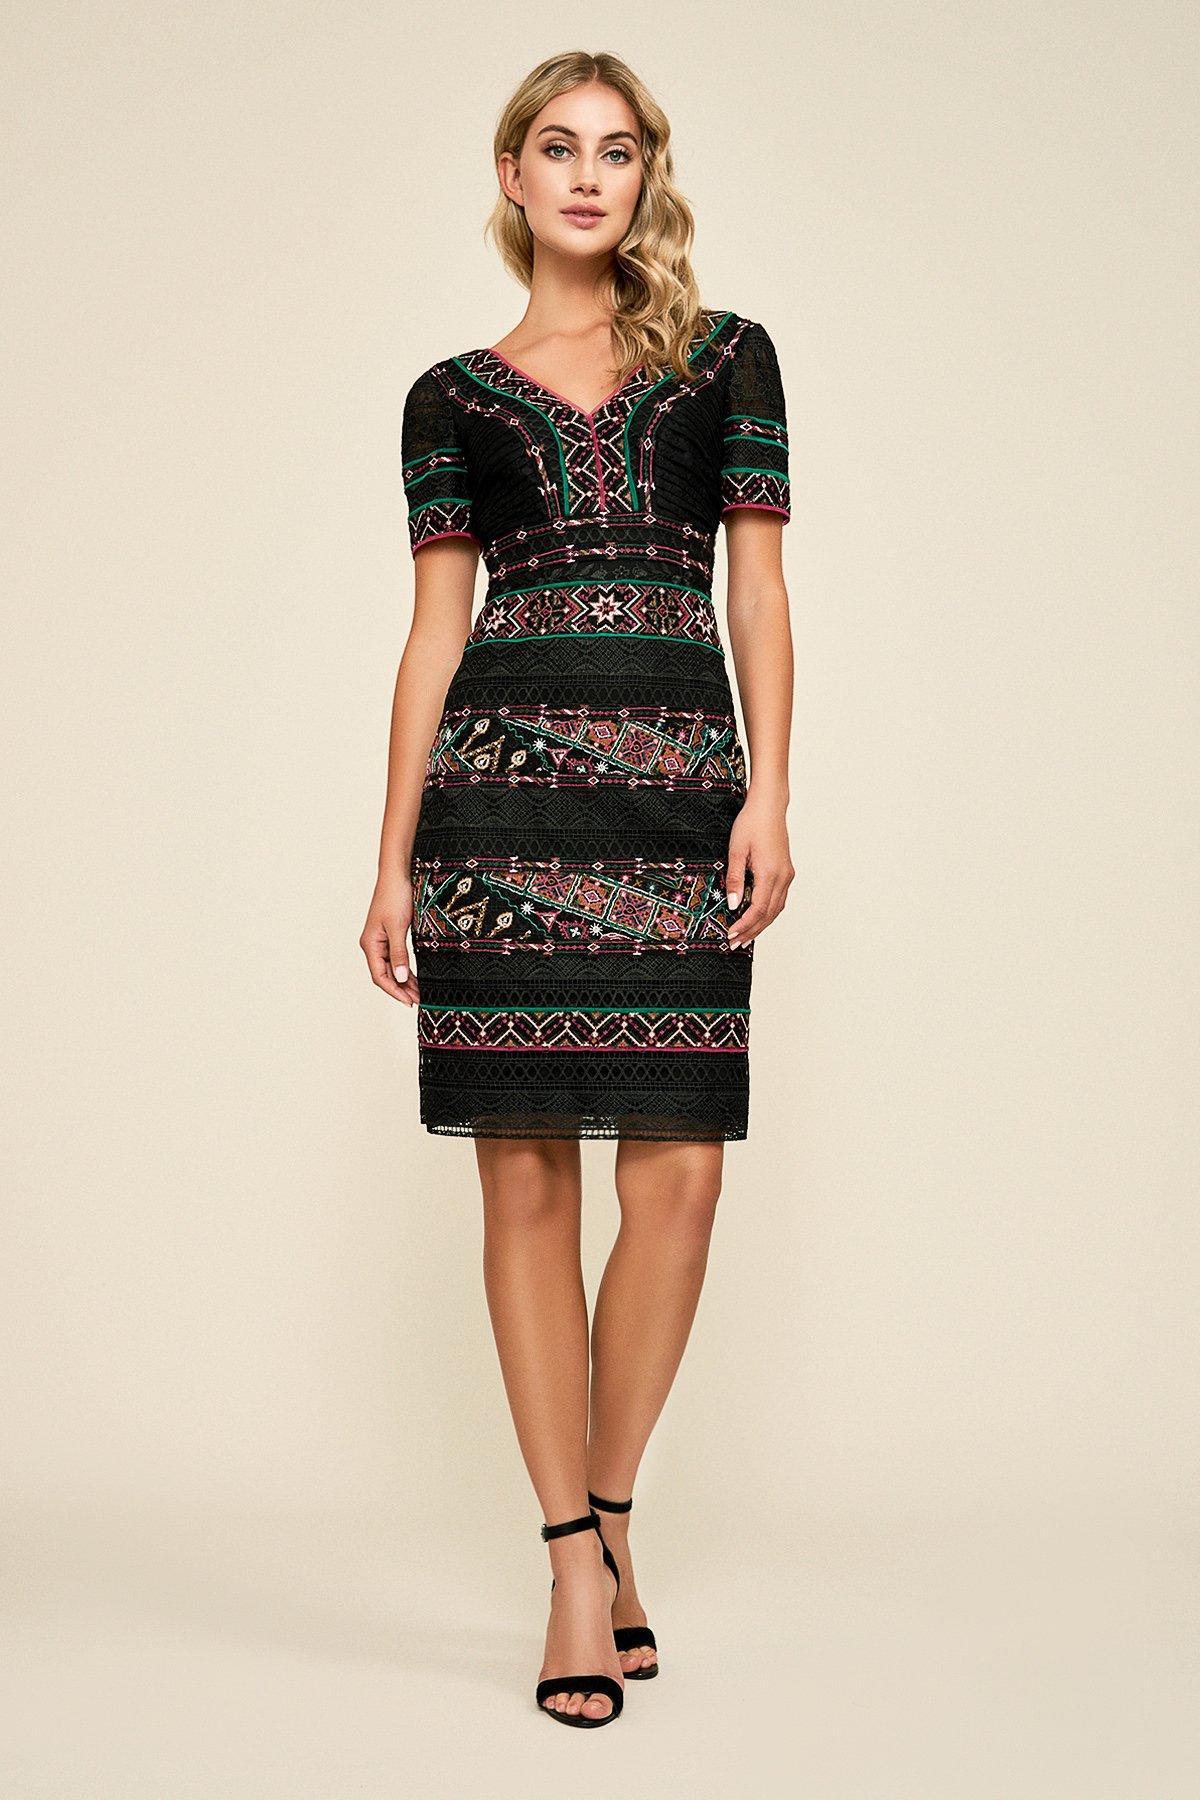 ca02c3da Tadashi Shoji - Black Embroidered Lace V-neck Knee Length Sheath Dress -  Lyst. View fullscreen